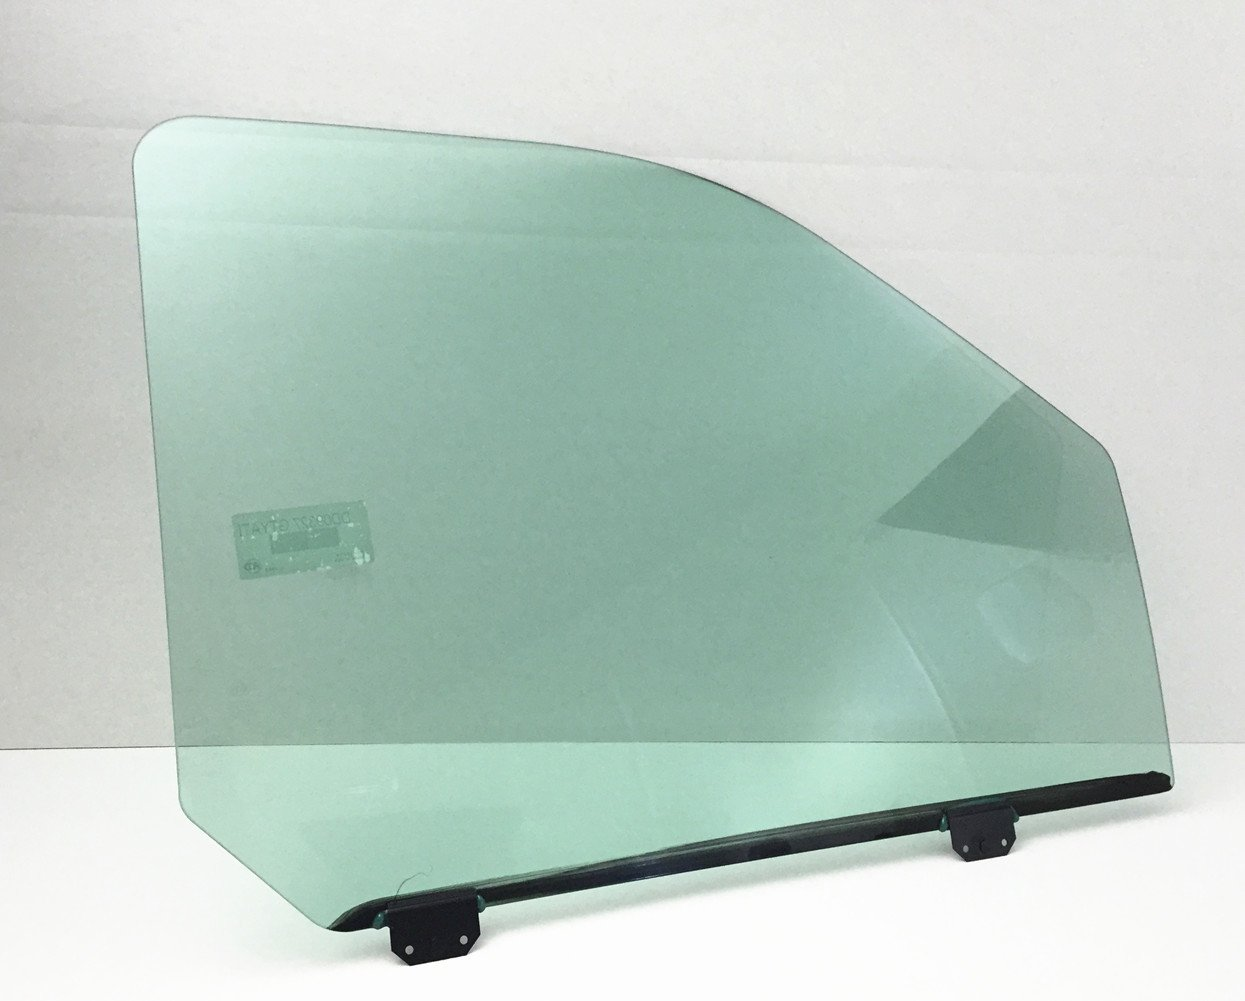 TYG Fits 1999-2012 Ford F250 F350 F450 F550 F650 F750 Passenger Side Right Front Door Window Glass